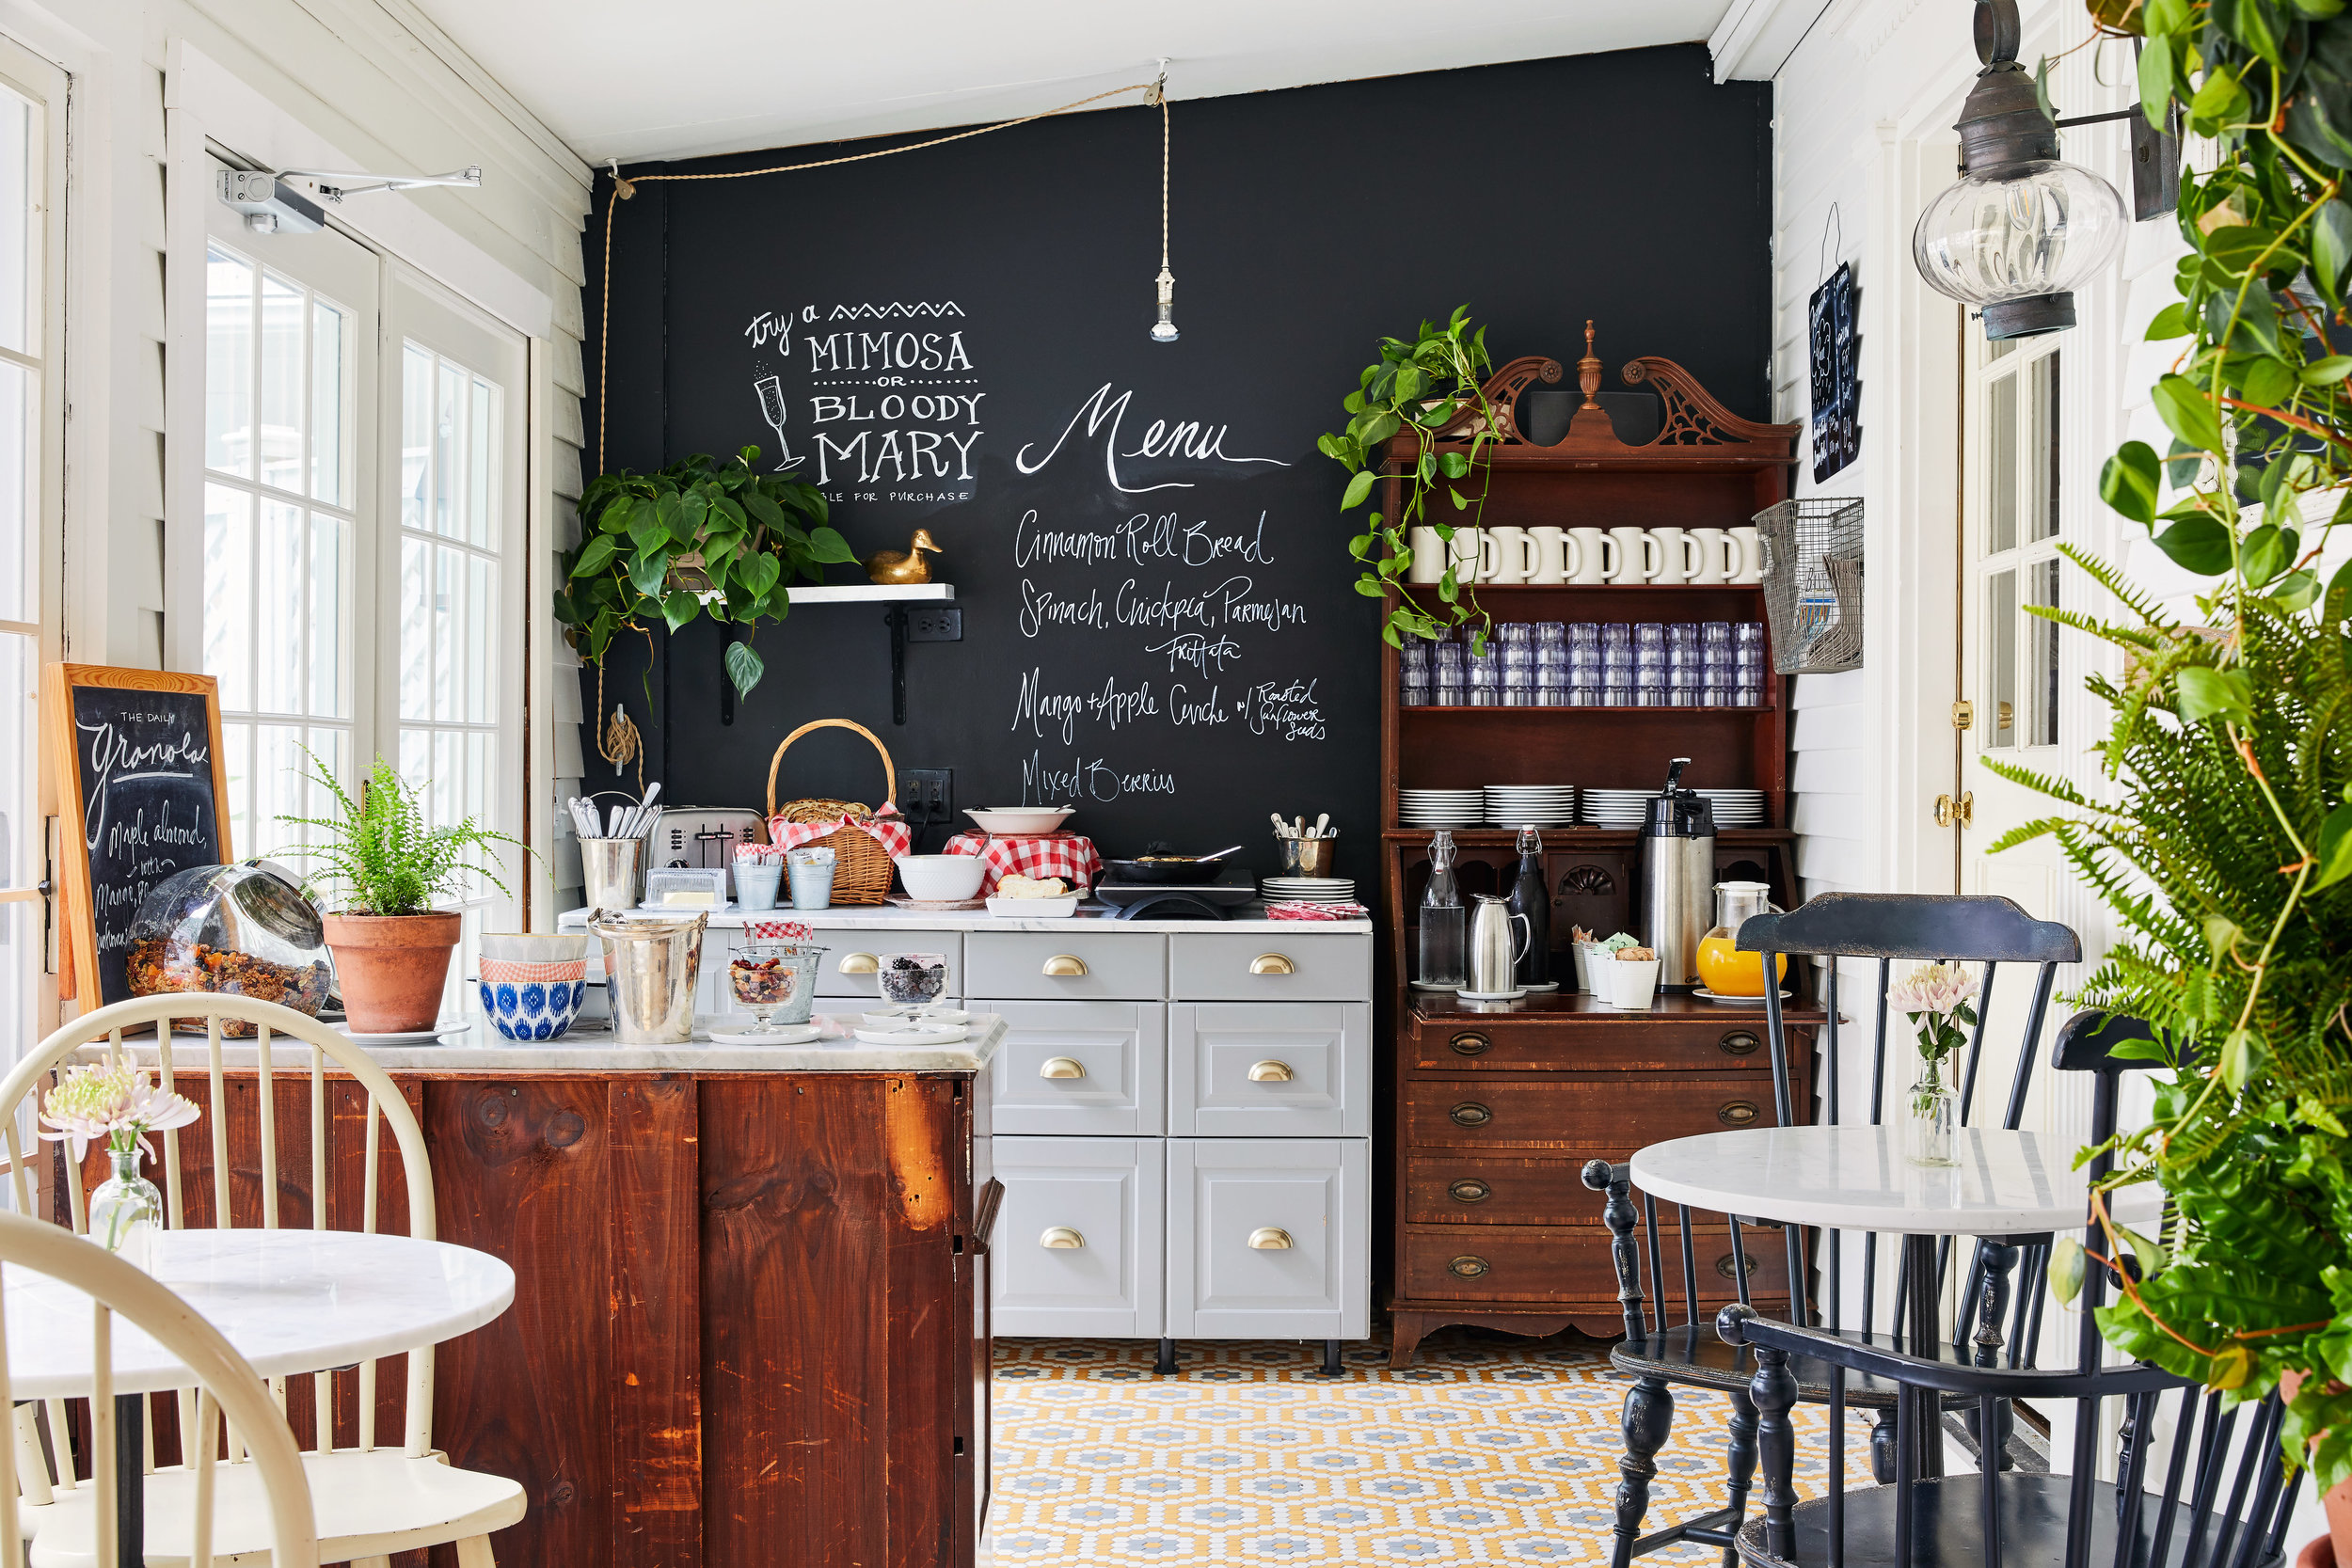 breakfast room with menu board